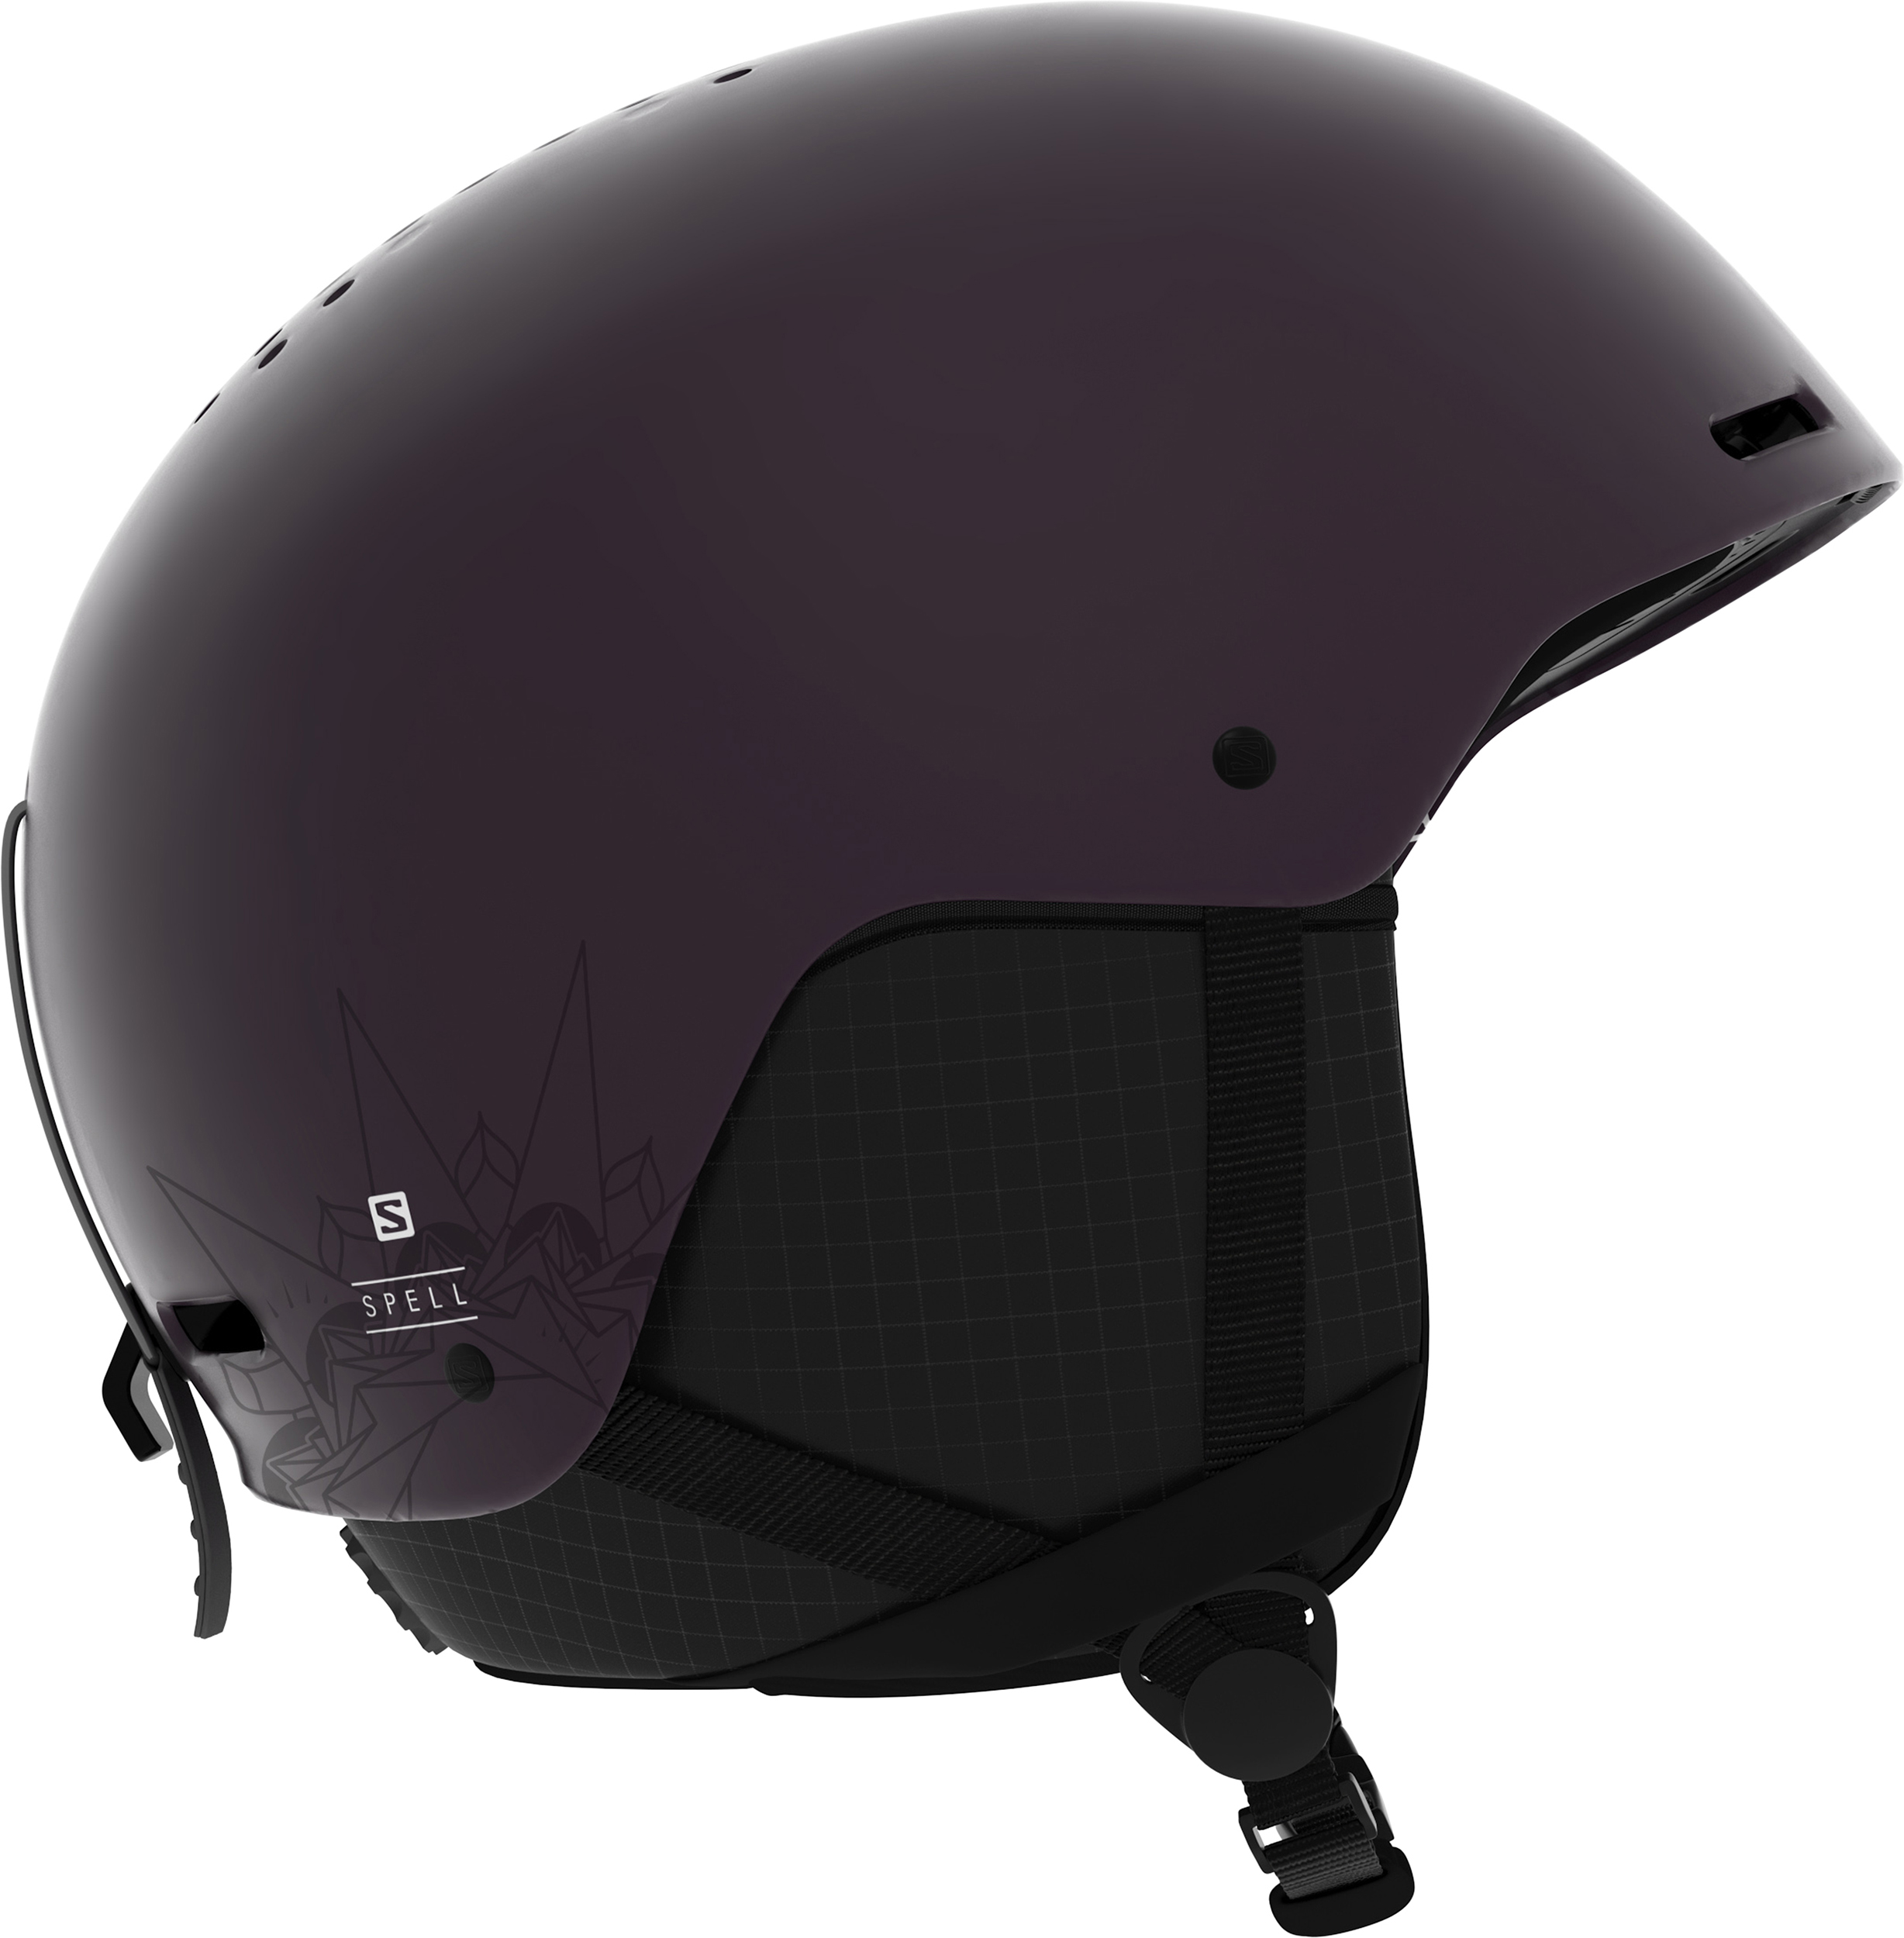 878598aa915 Ski and snowboard helmets | MEC